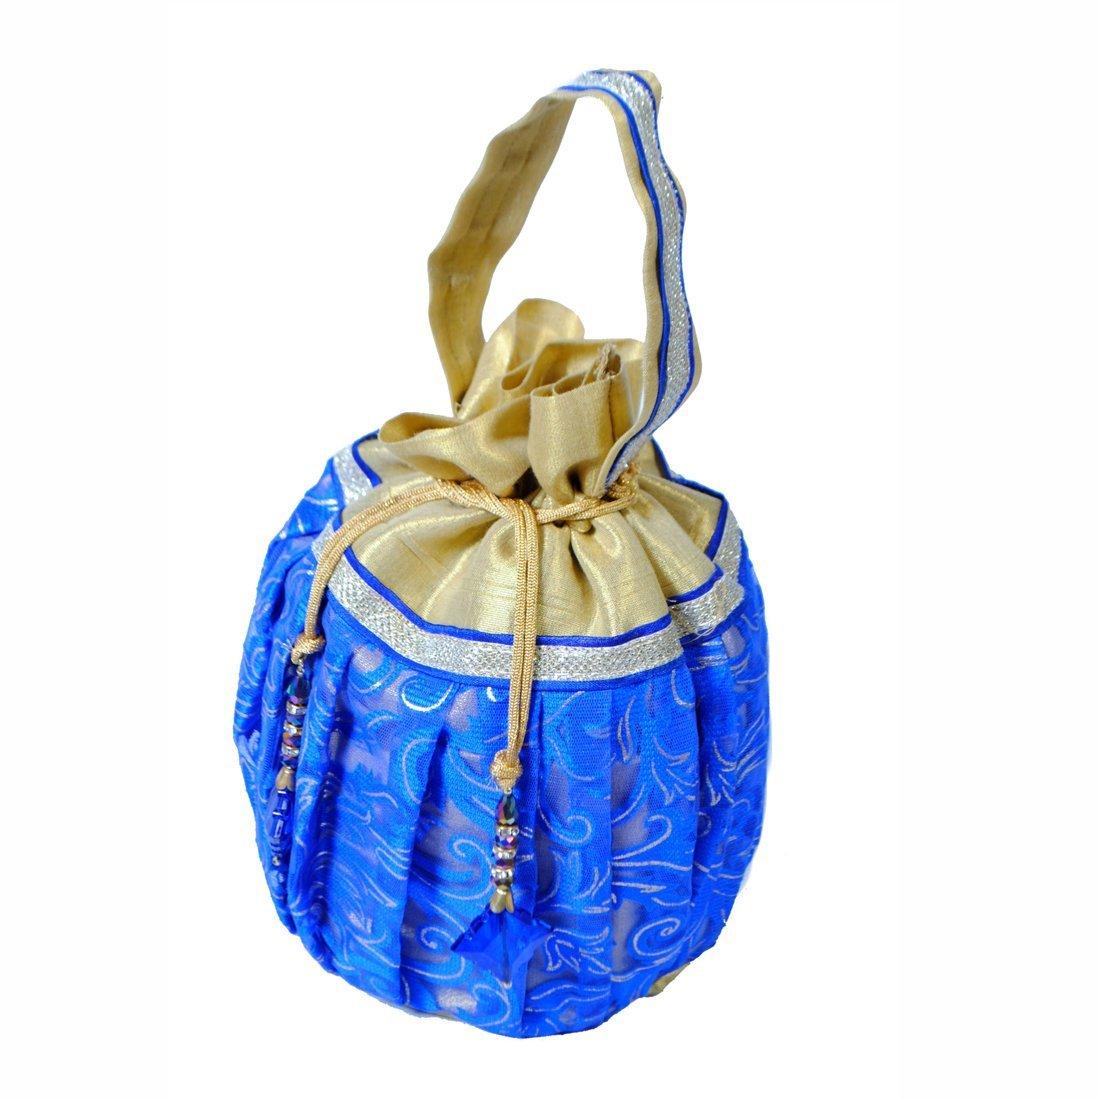 Maitri Creations Women Traditional Silk Brocade Purse Potli Bag Drawstring Jewelry Pouch Bag Cotton Gift Bag Value Set Wristlet Beaded Handbag Wedding Evening Party Designer Bridal Clutch Blue